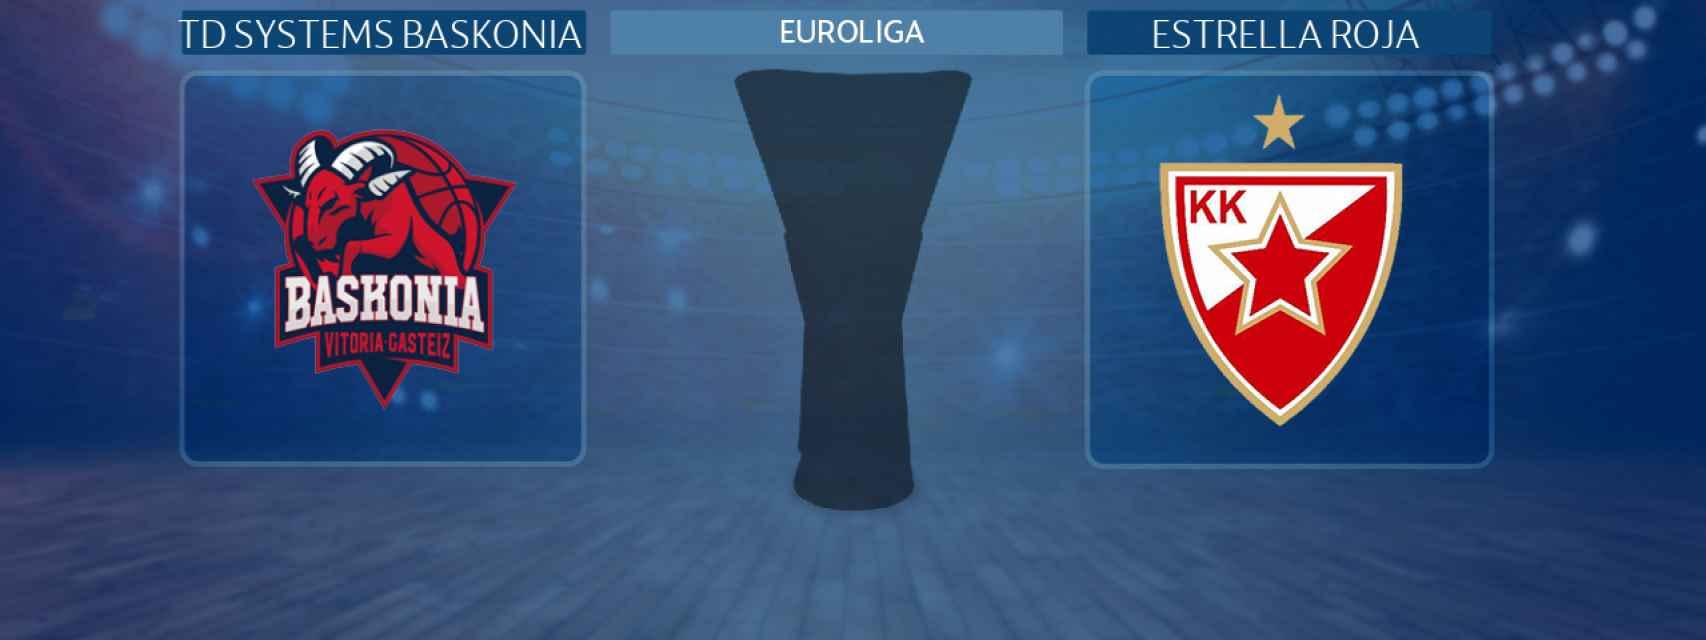 TD Systems Baskonia - Estrella Roja, partido de la Euroliga